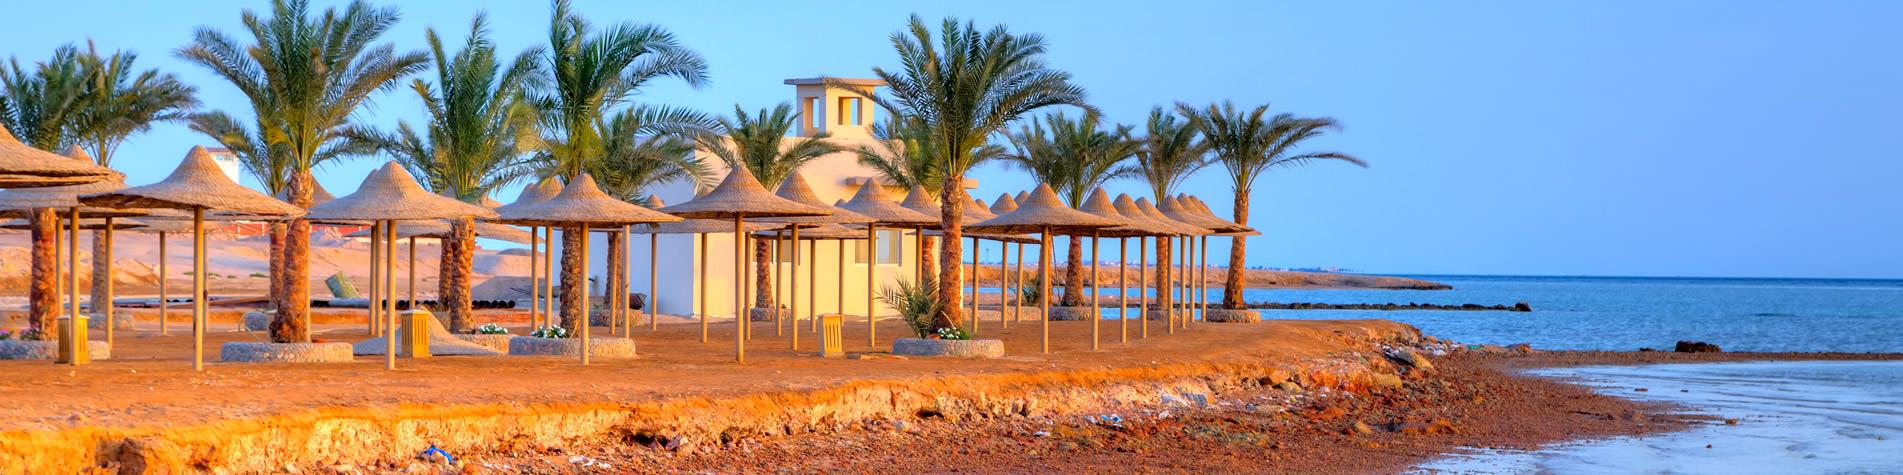 Stunning Hurghada Holidays